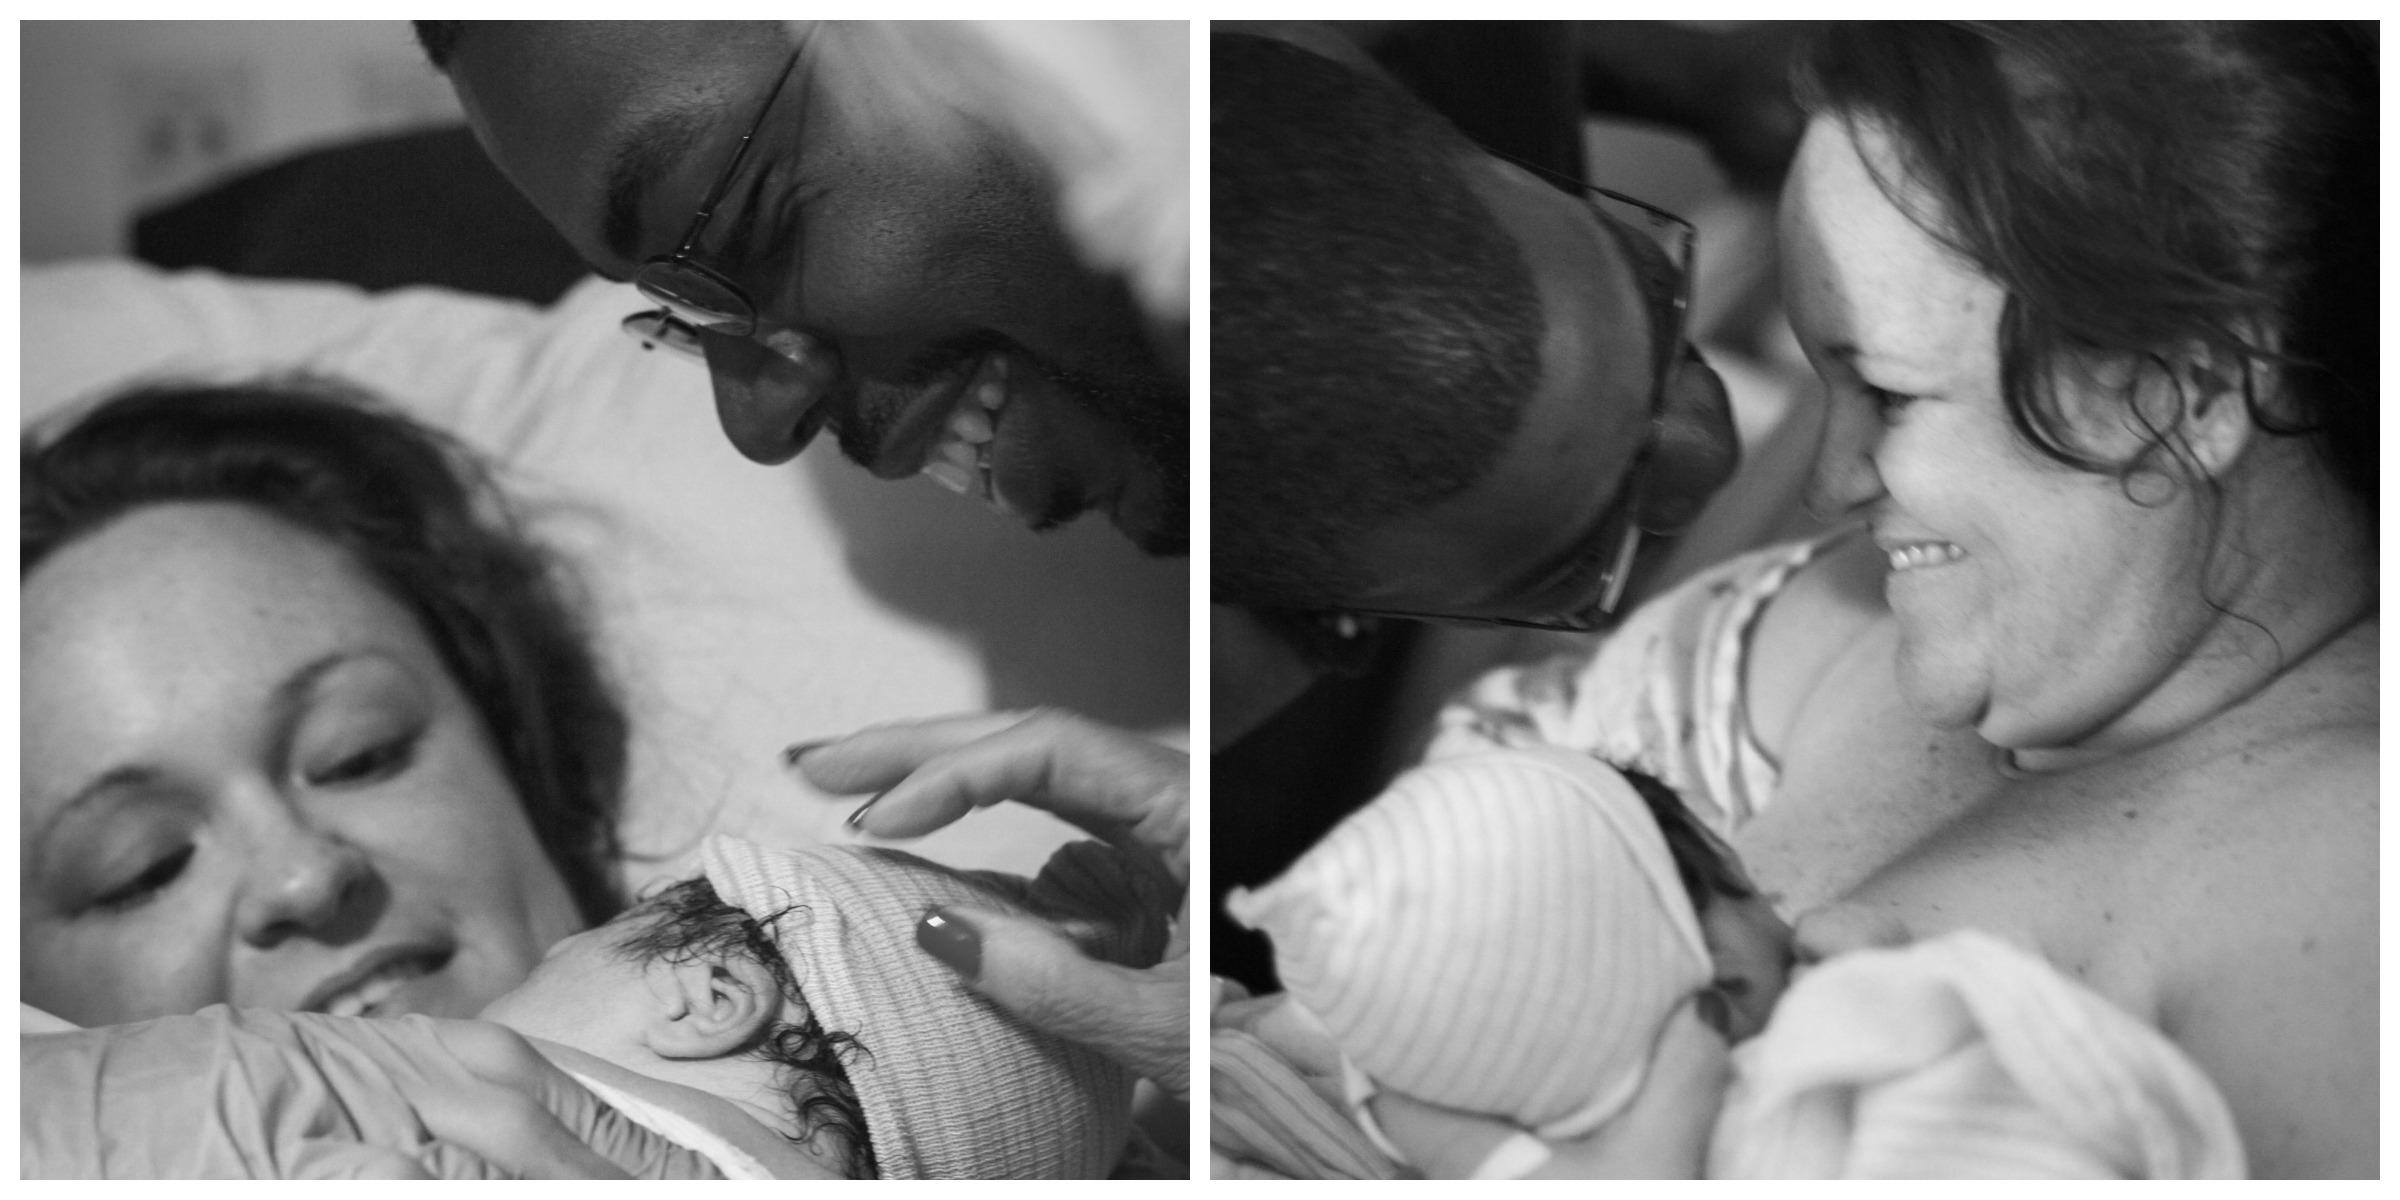 homebirth, florida homebirth, home birth, brandon home birth, st pete home birth, tampa vbac, Tampa Bay Birth Network, TBBN, Natural Birth and Baby Expo, Tampa VBAC options, Barefoot Birth, Improving Birth tampa , childbirth education tampa, childbirth ed tampa, lamaze tampa, hypnobirthing tampa, birth boot camp tampa, birth classes tampa, tampa Birth Photographer, Midwife, Florida Midwife, Tampa Midwife, Brandon Midwife, Tampa Newborn photography, tampa maternity photography, brandon photography, brandon newborn photography, breastfeeding, tampa breastfeeding, tampa placenta encapsulation, tampa homebirth, homebirth, brandon home birth, brandon homebirth, tampa home birth, st pete homebirth, st pete home birth, tampa birth center, st pete birth center, prenatal massage tampa, tampa massage therapist, tampa craniosacral therapy, tampa doula, brandon doula, brandon postpartum doula, tampa full spectrum support, the fourth trimester, breastfeeding support tampa, breastfeeding support clearwater, breastfeeding support st pete, birth center tampa fl, birth center brandon fl, birth center st pete fl, birth center clearwater fl, interviewing a midwife, midwife questions, questions for a midwife, interviewing a birth center, kim verbarg, kimberly verbarg, labor of love, breath of life birth center, labor of love birth center